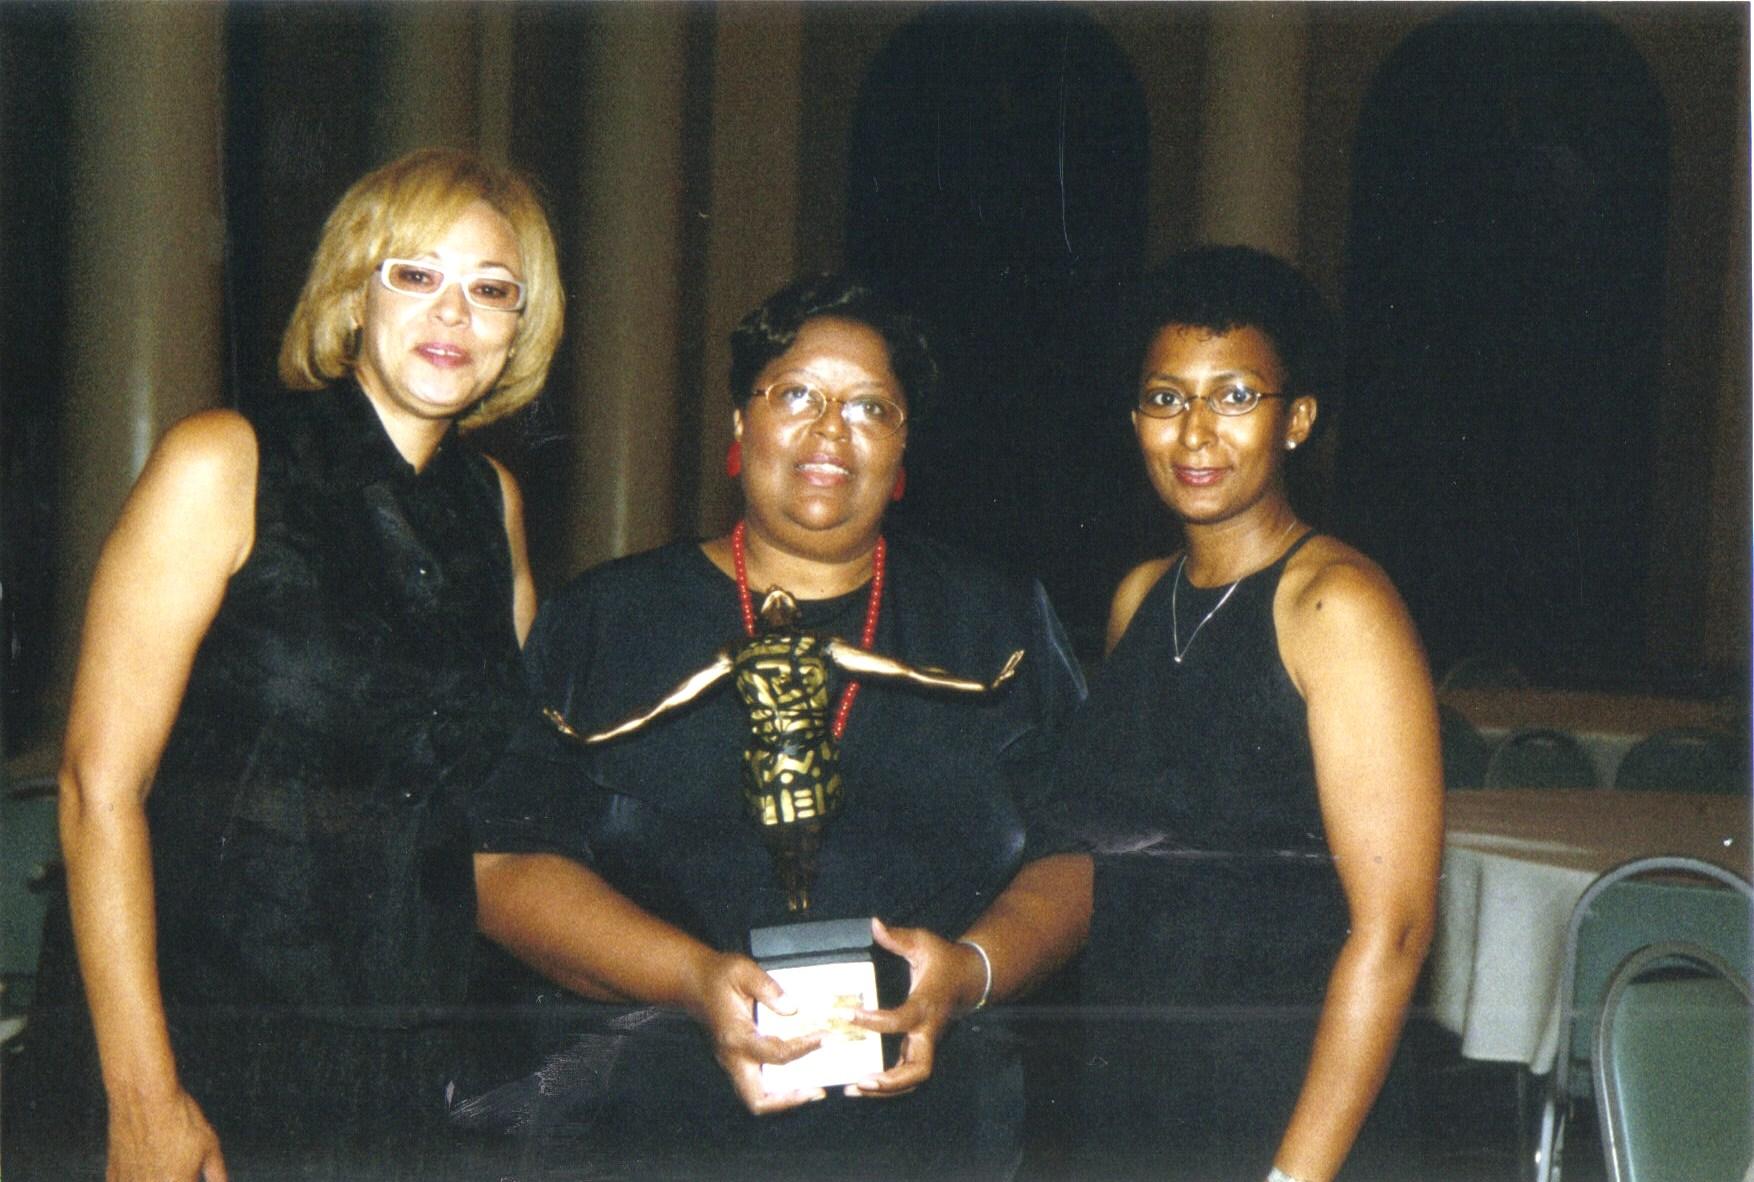 2000 - [Left to Right] Susan Ellis, Irma Ward, Ameera Ashraf O'Neil